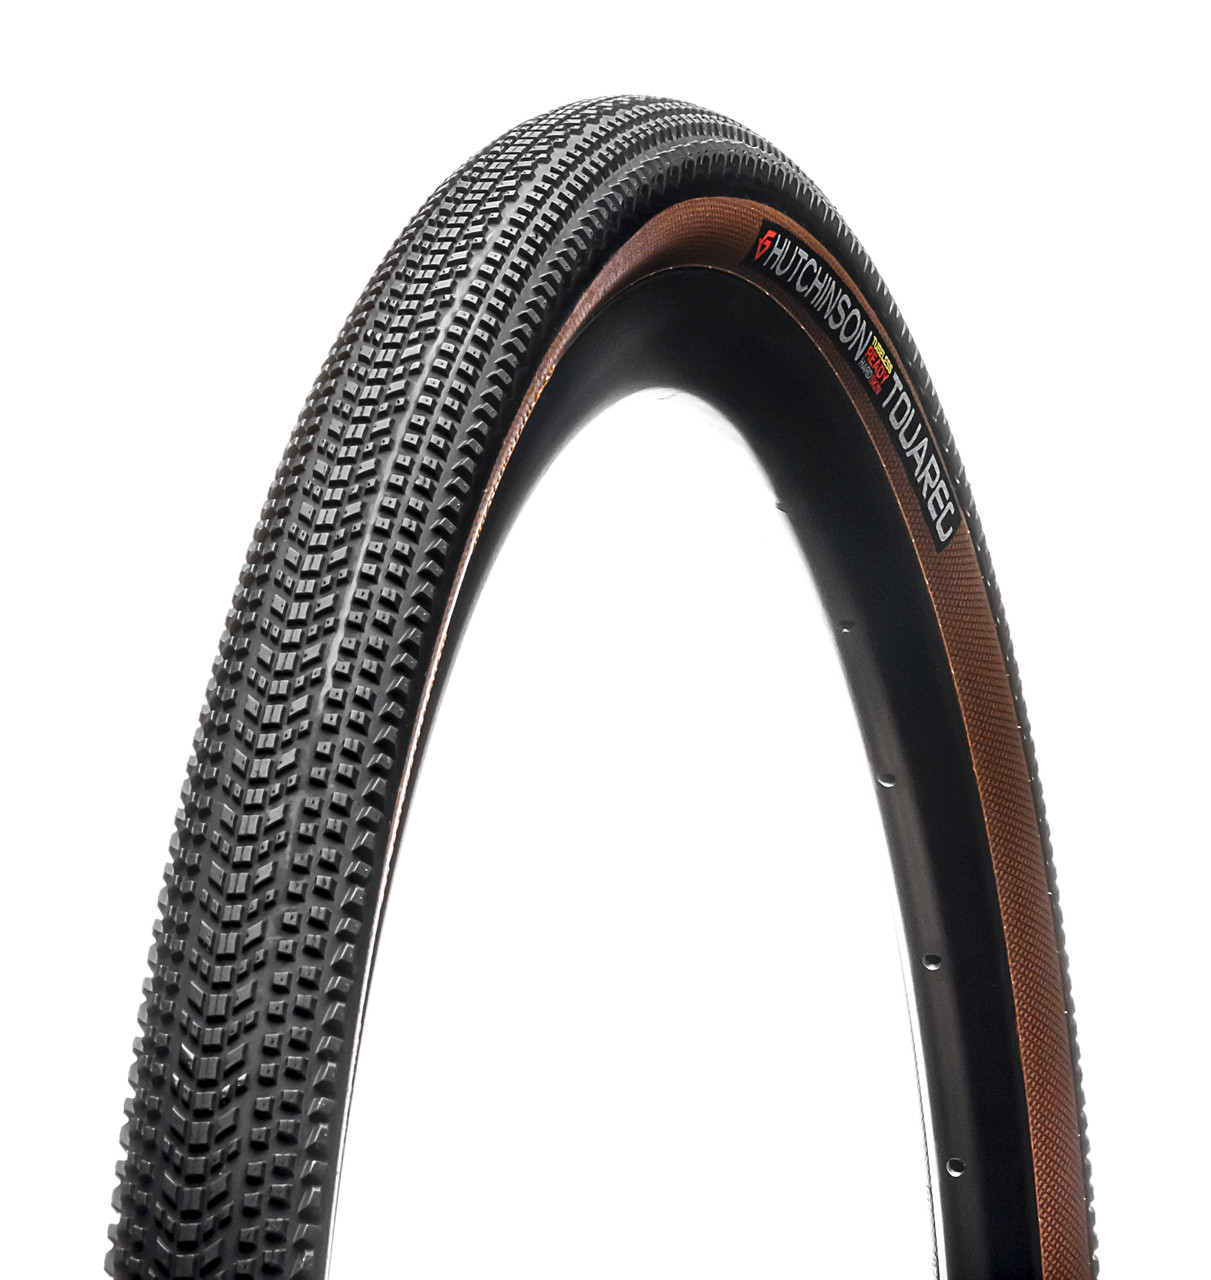 Hutchinson Touareg Tubeless Ready Gravel Tan Wall Tyre 650 x 47